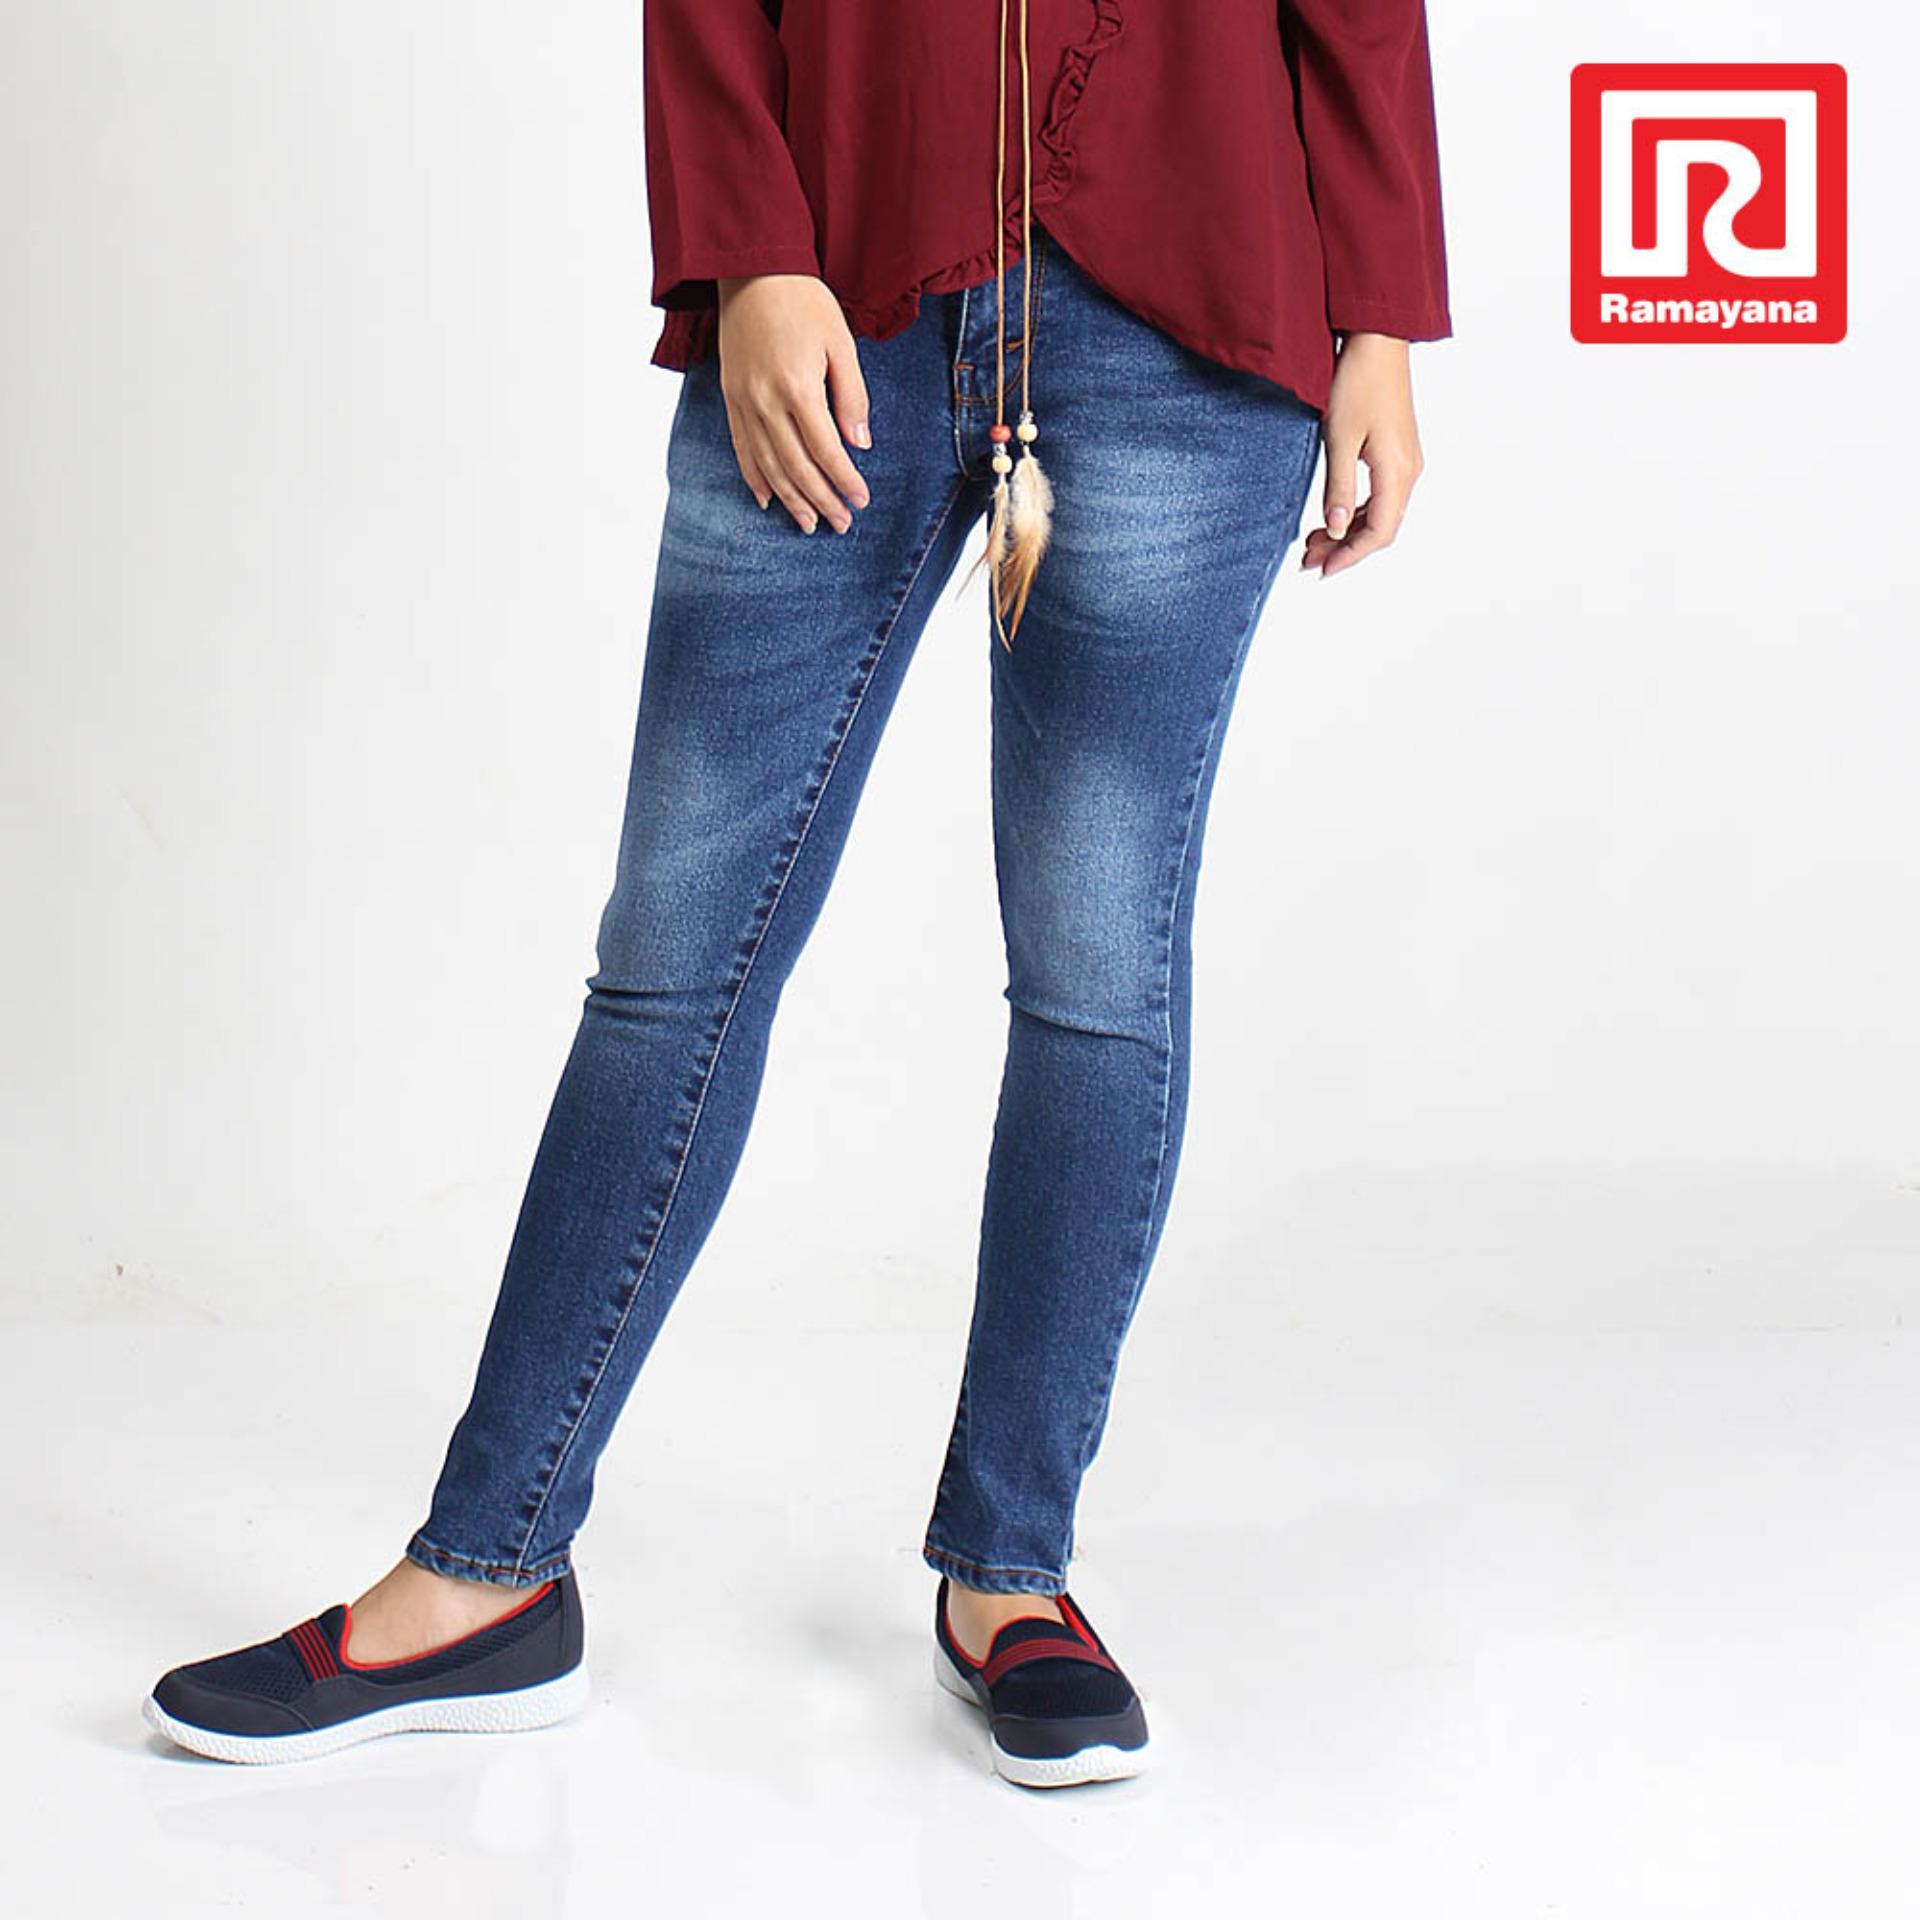 Diskon Ramayana Jj Jeans Celana Jeans Panjang Wanita Regular Skinny Biru Biostone Jj Jeans 07965347 Jj Jeans Di Jawa Barat